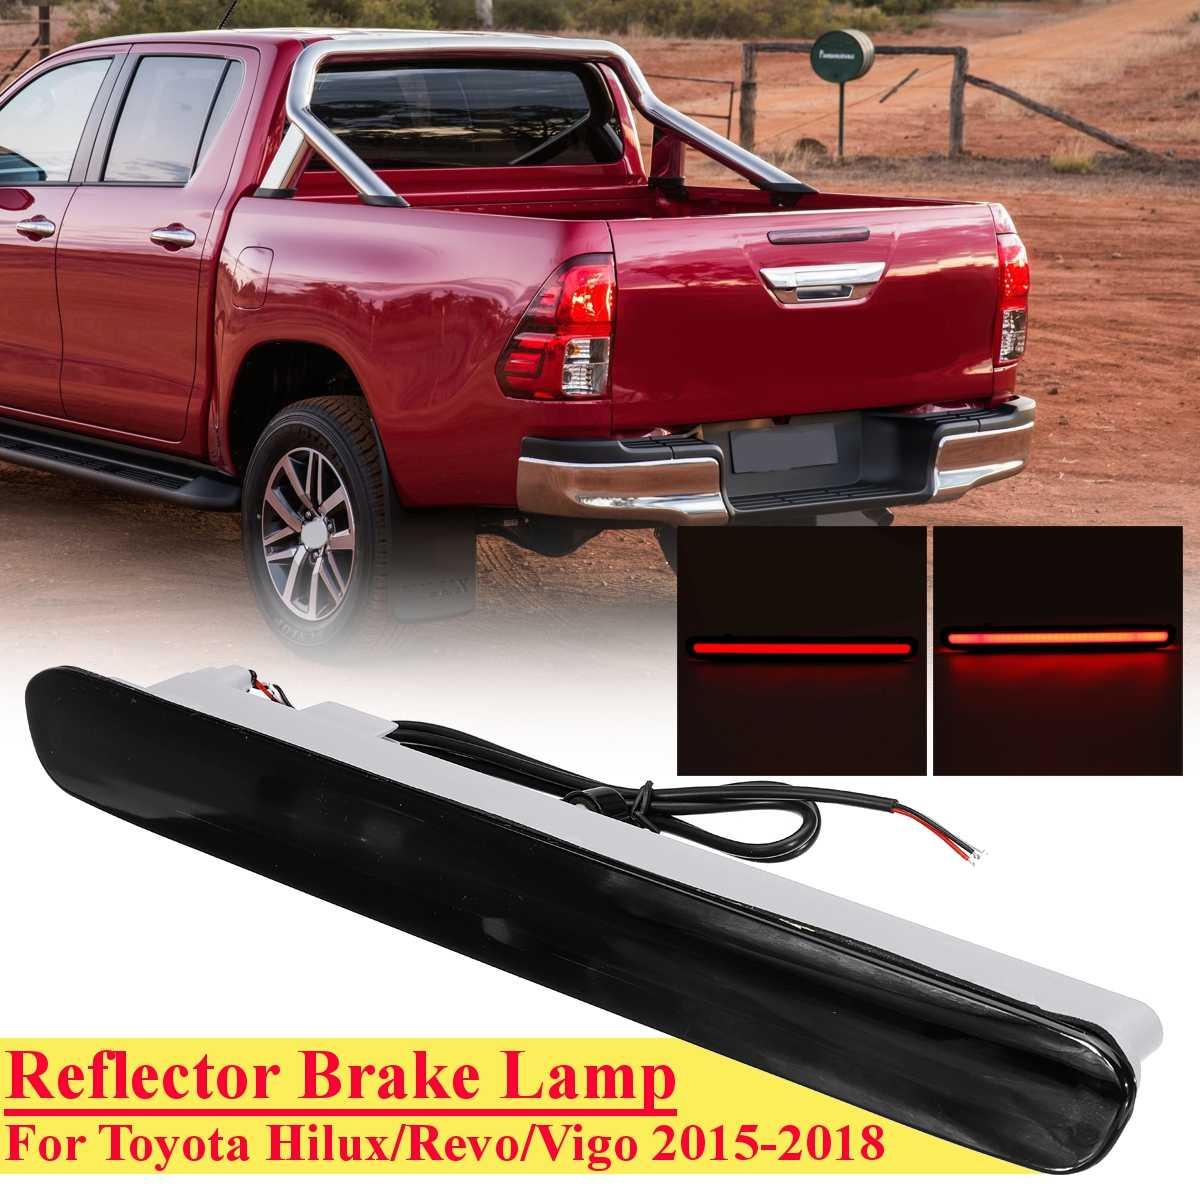 Luz de freno trasera de humo Led de coche para Toyota Hilux Revo Vigo 2015-2018 cola de parada media de alto freno lámpara de freno Accesorios